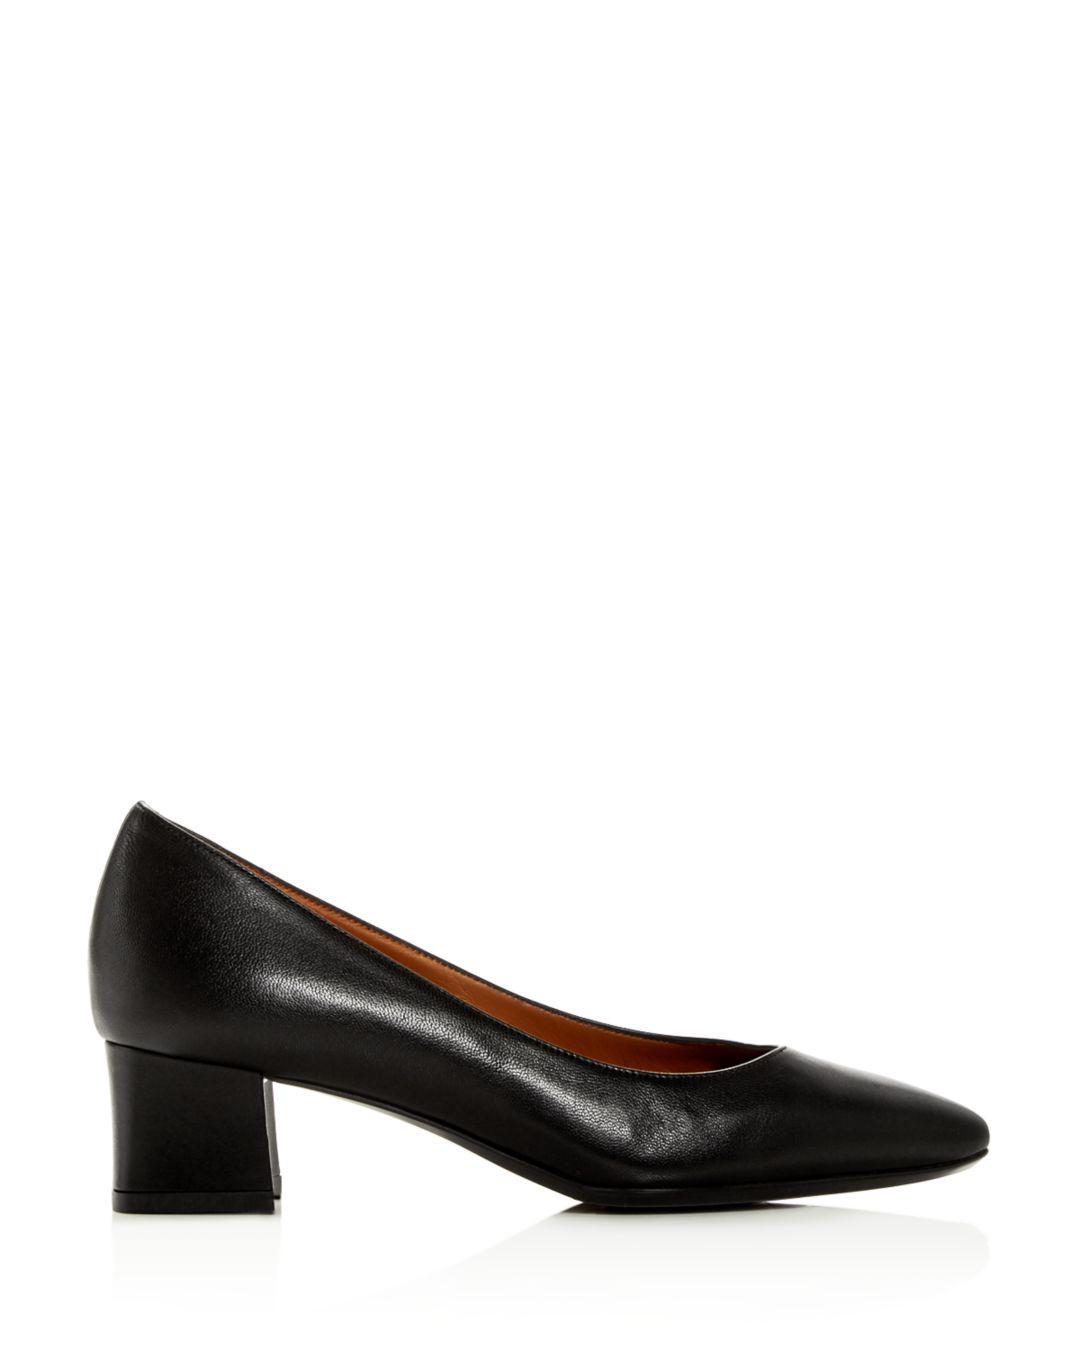 7b42cbb713e8 Lyst - Aquatalia Women s Pasha Weatherproof Block-heel Pumps in Black